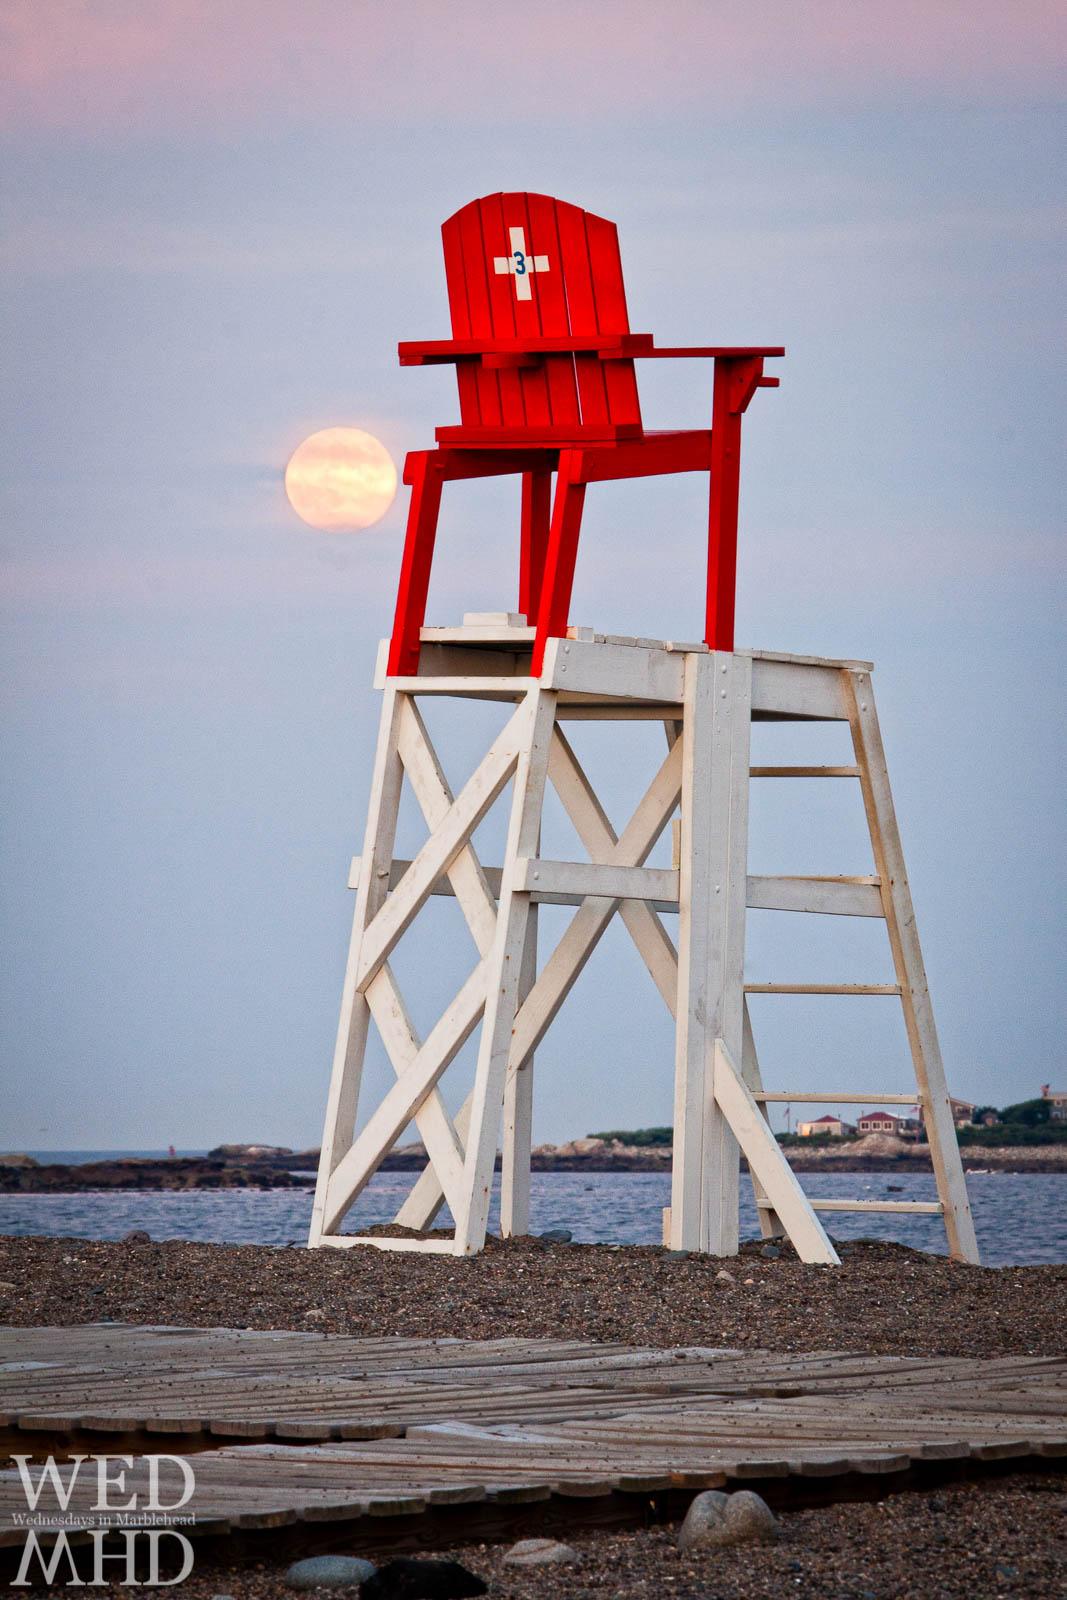 The Sturgeon Moon rises over Devereux Beach